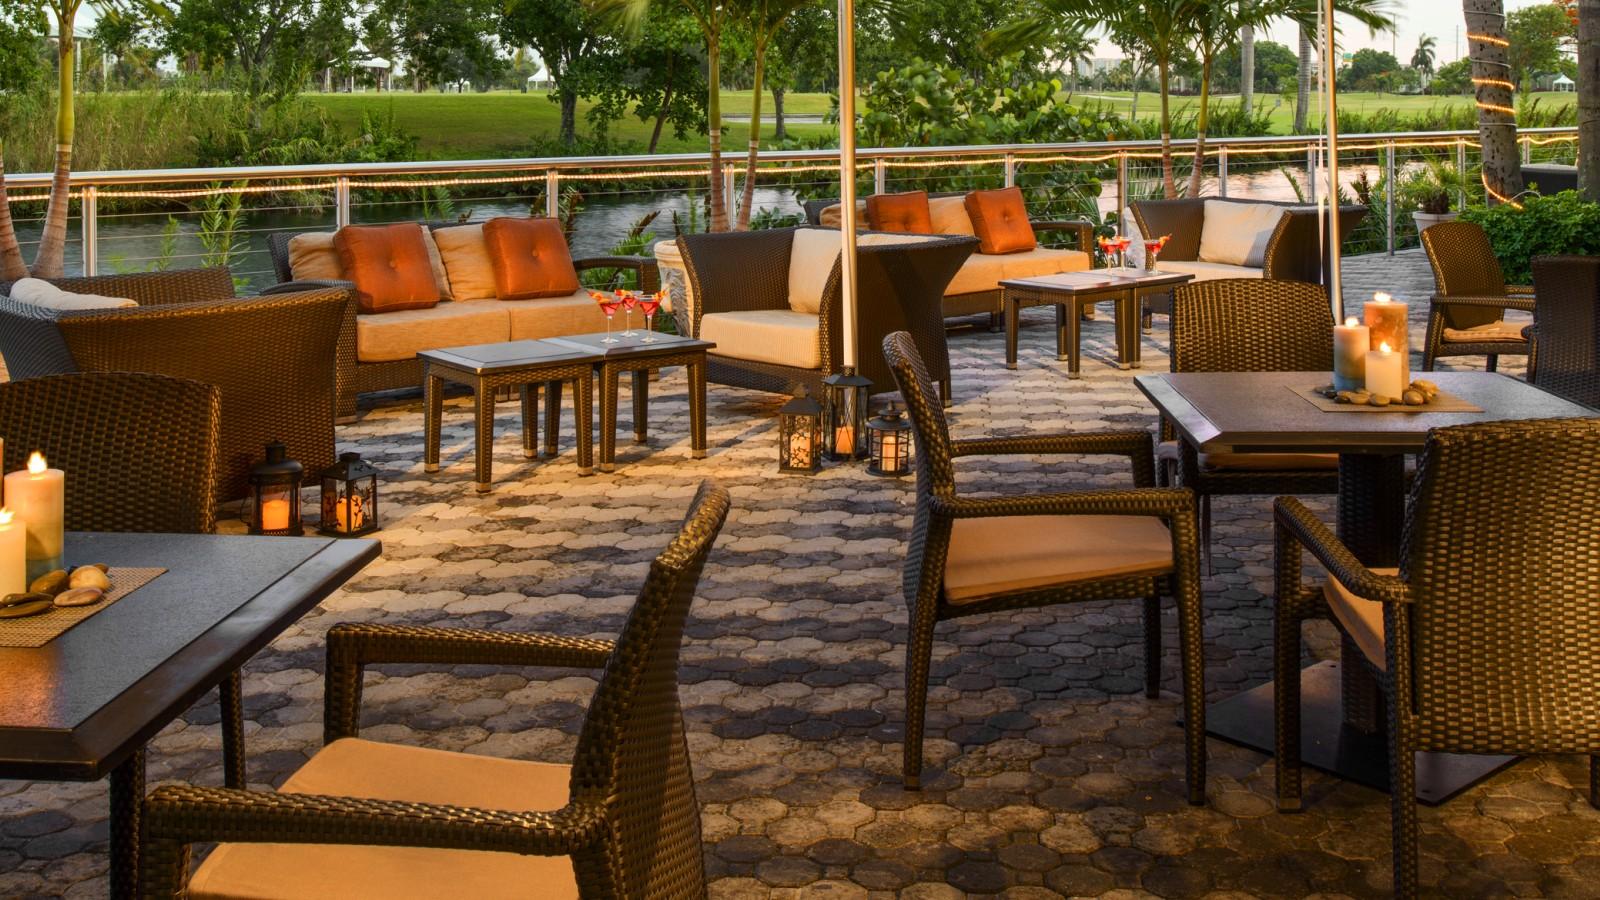 Sheraton Miami Airport Hotel & Executive Meeting Center image 15